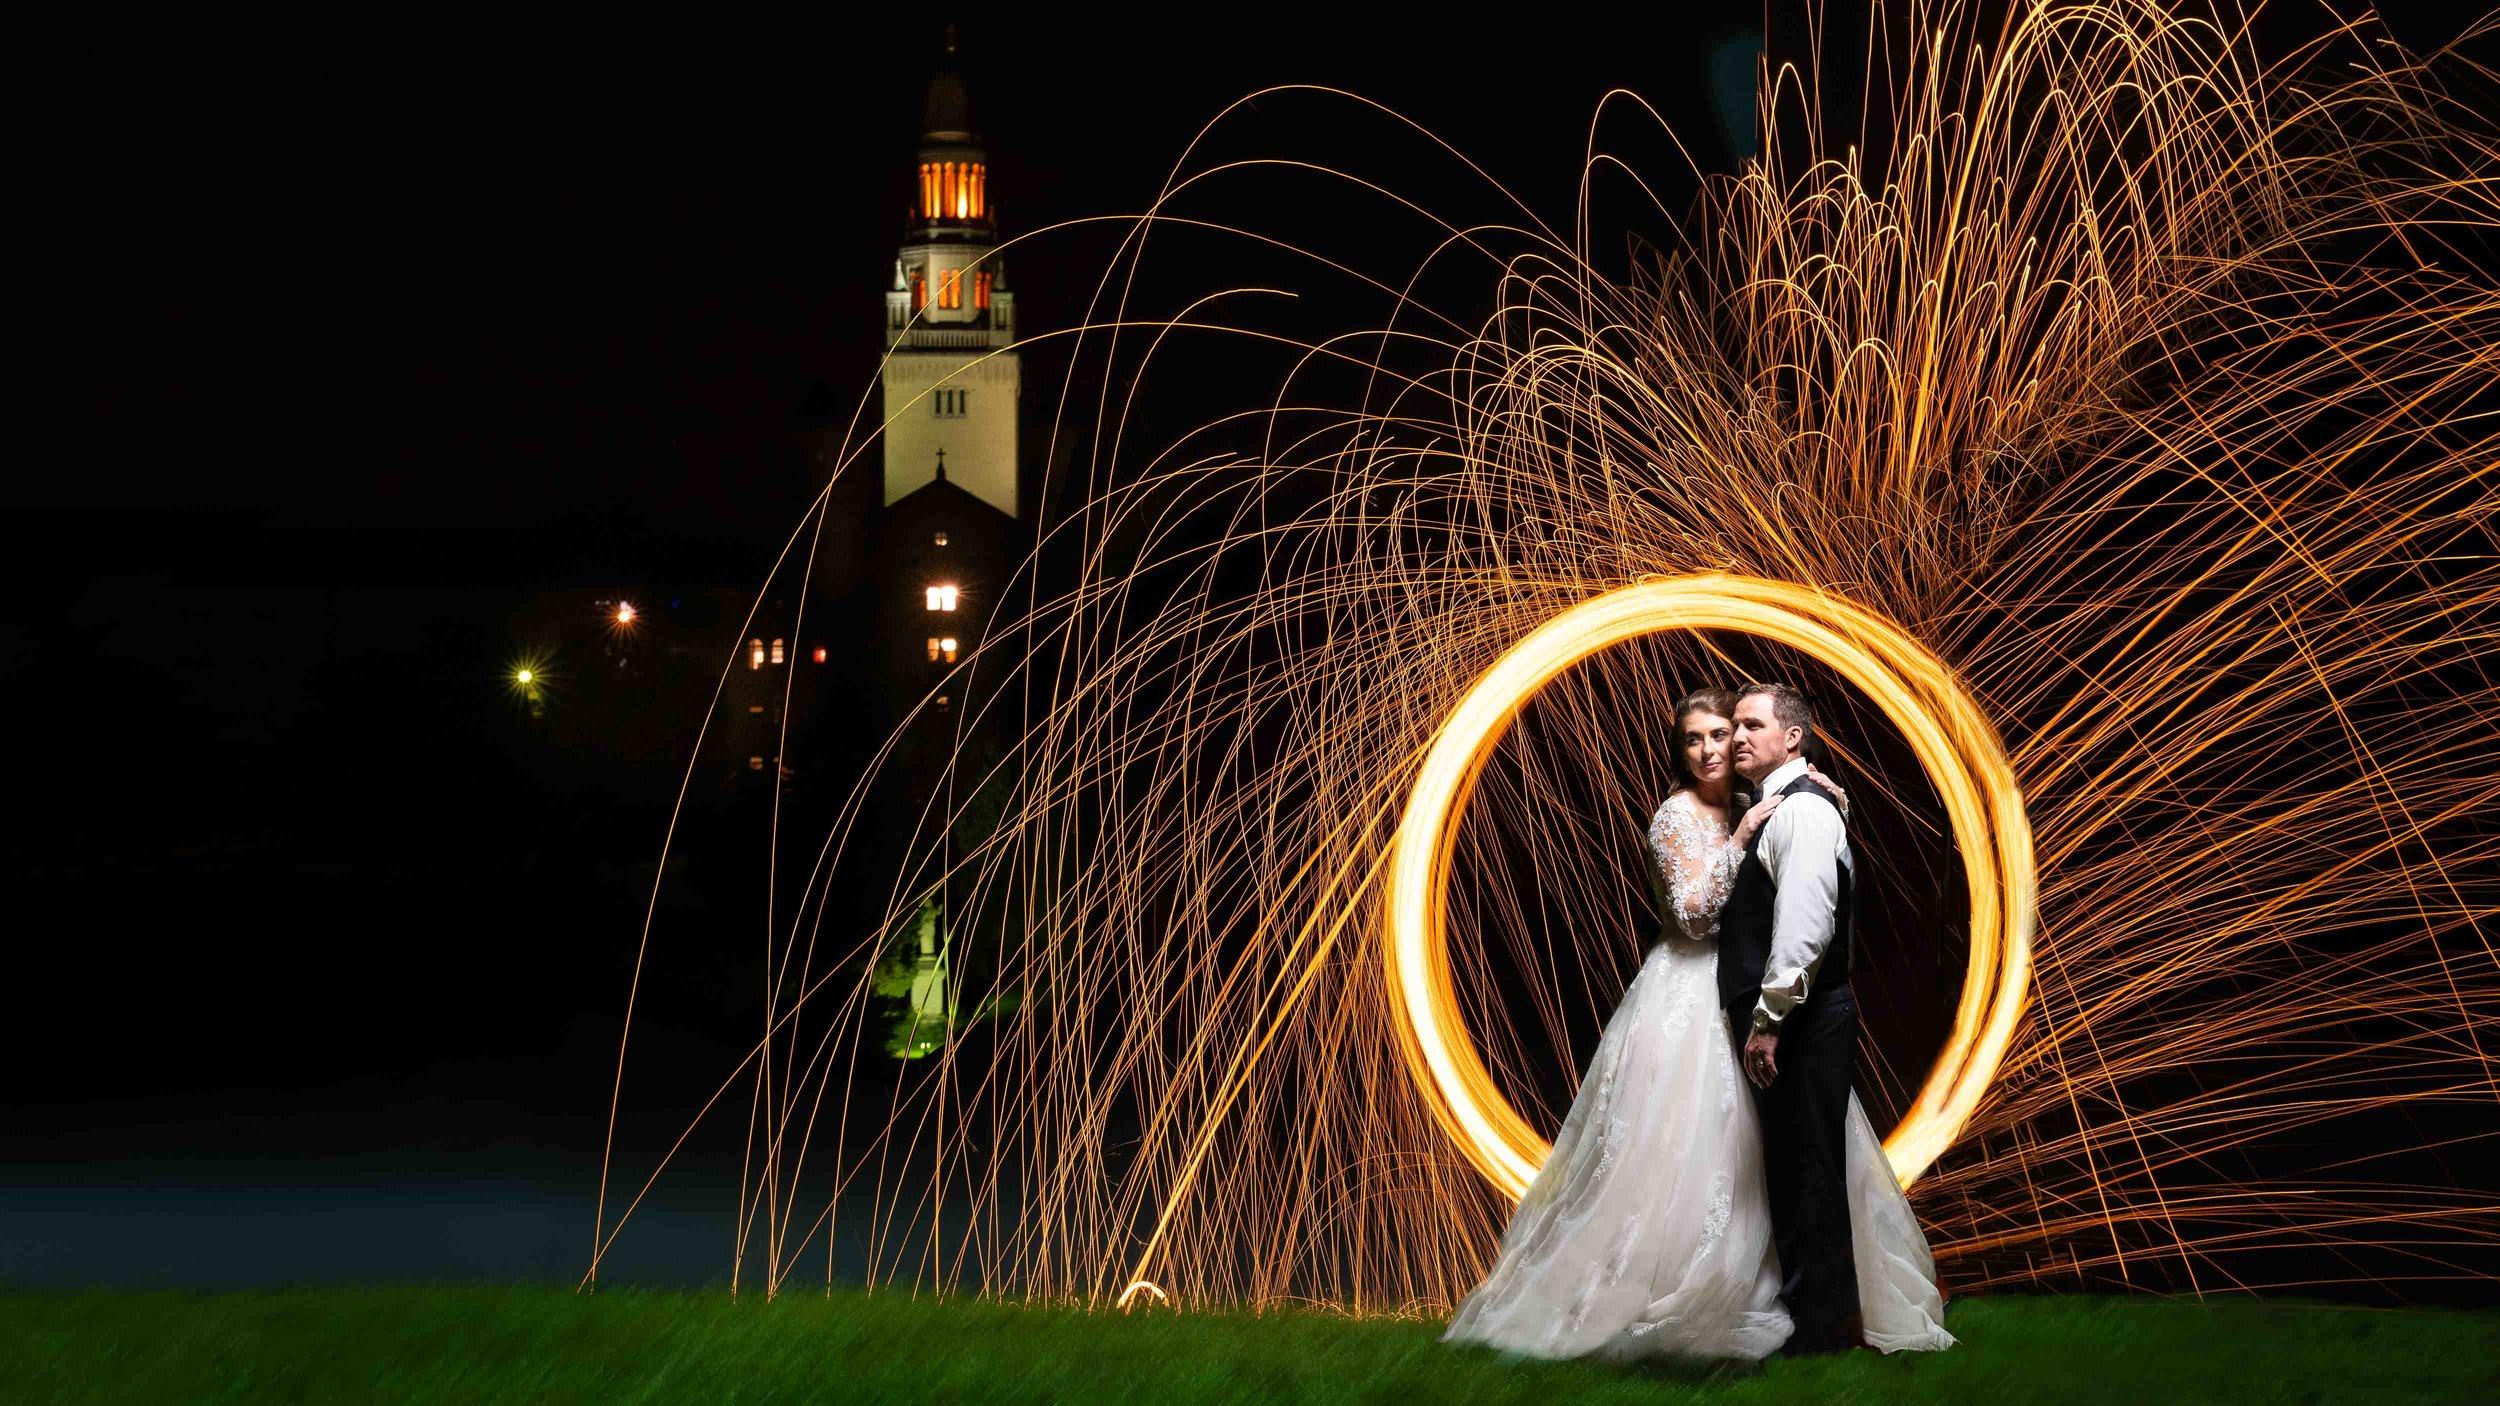 Wedding-Reception-Spinning-Fire-Photo-Bride-and-Groom-1.jpg